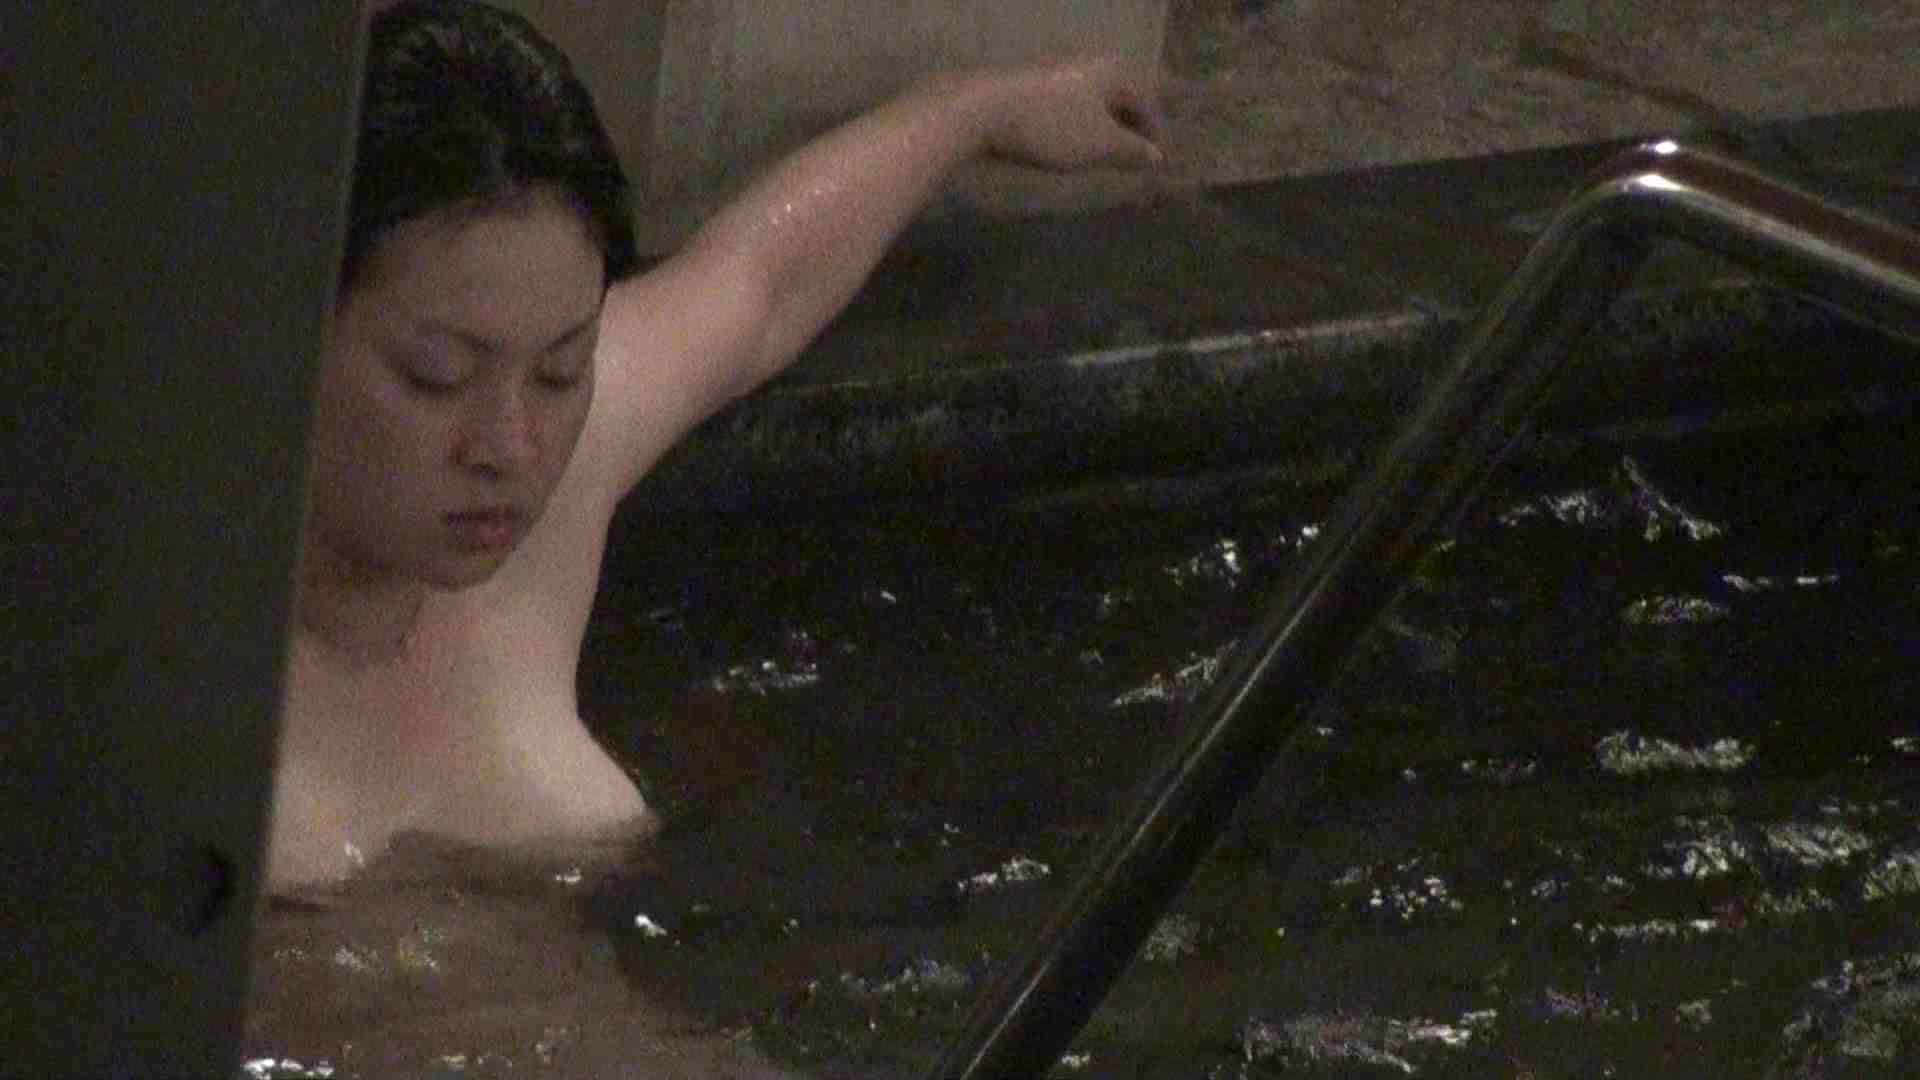 Aquaな露天風呂Vol.338 露天風呂編  82PIX 30